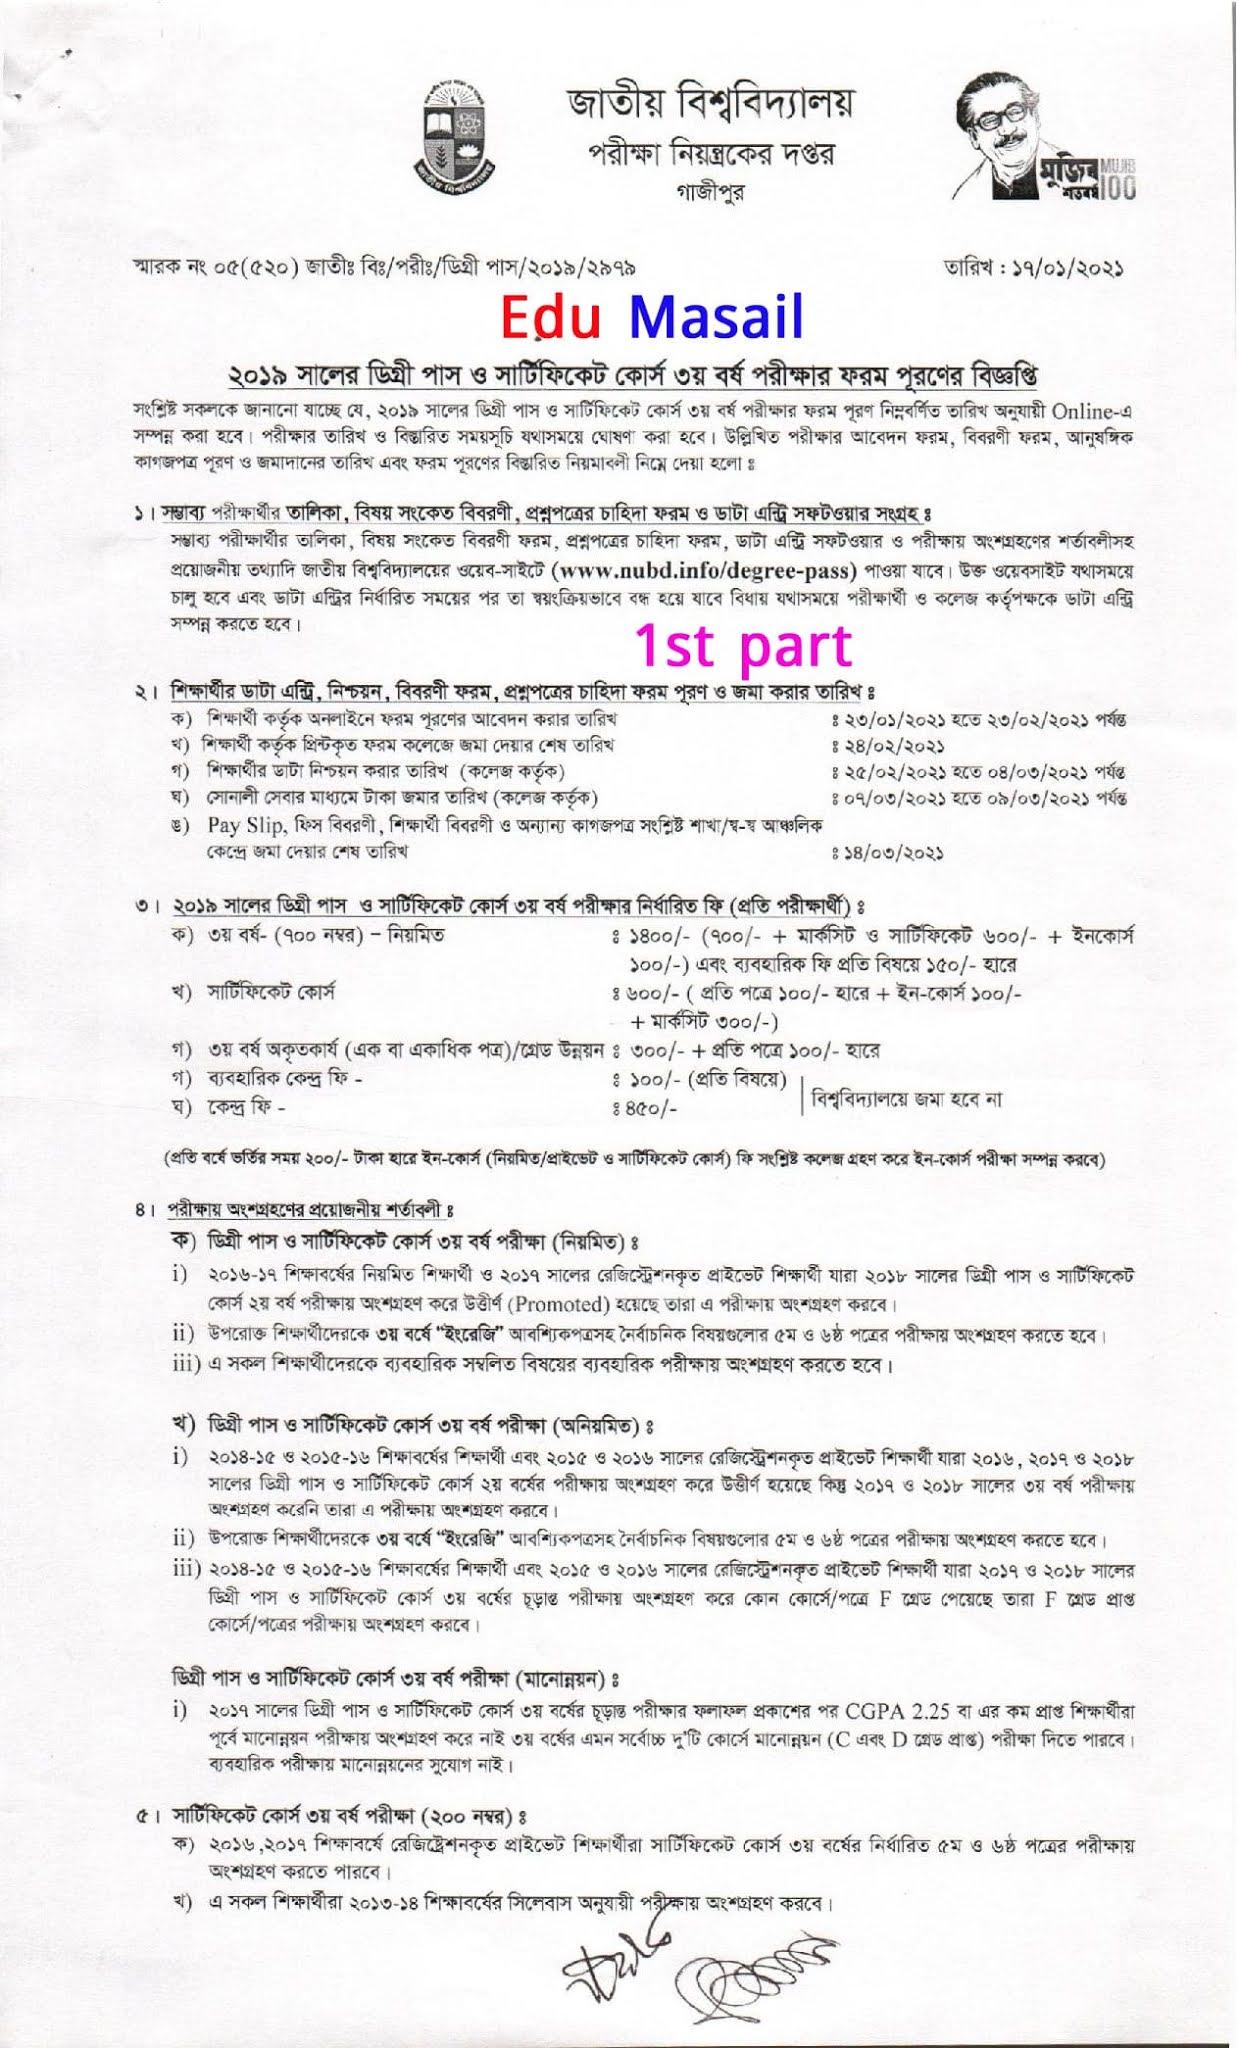 degree 3rd year form fillup 2021 - part 1 - edu masail -